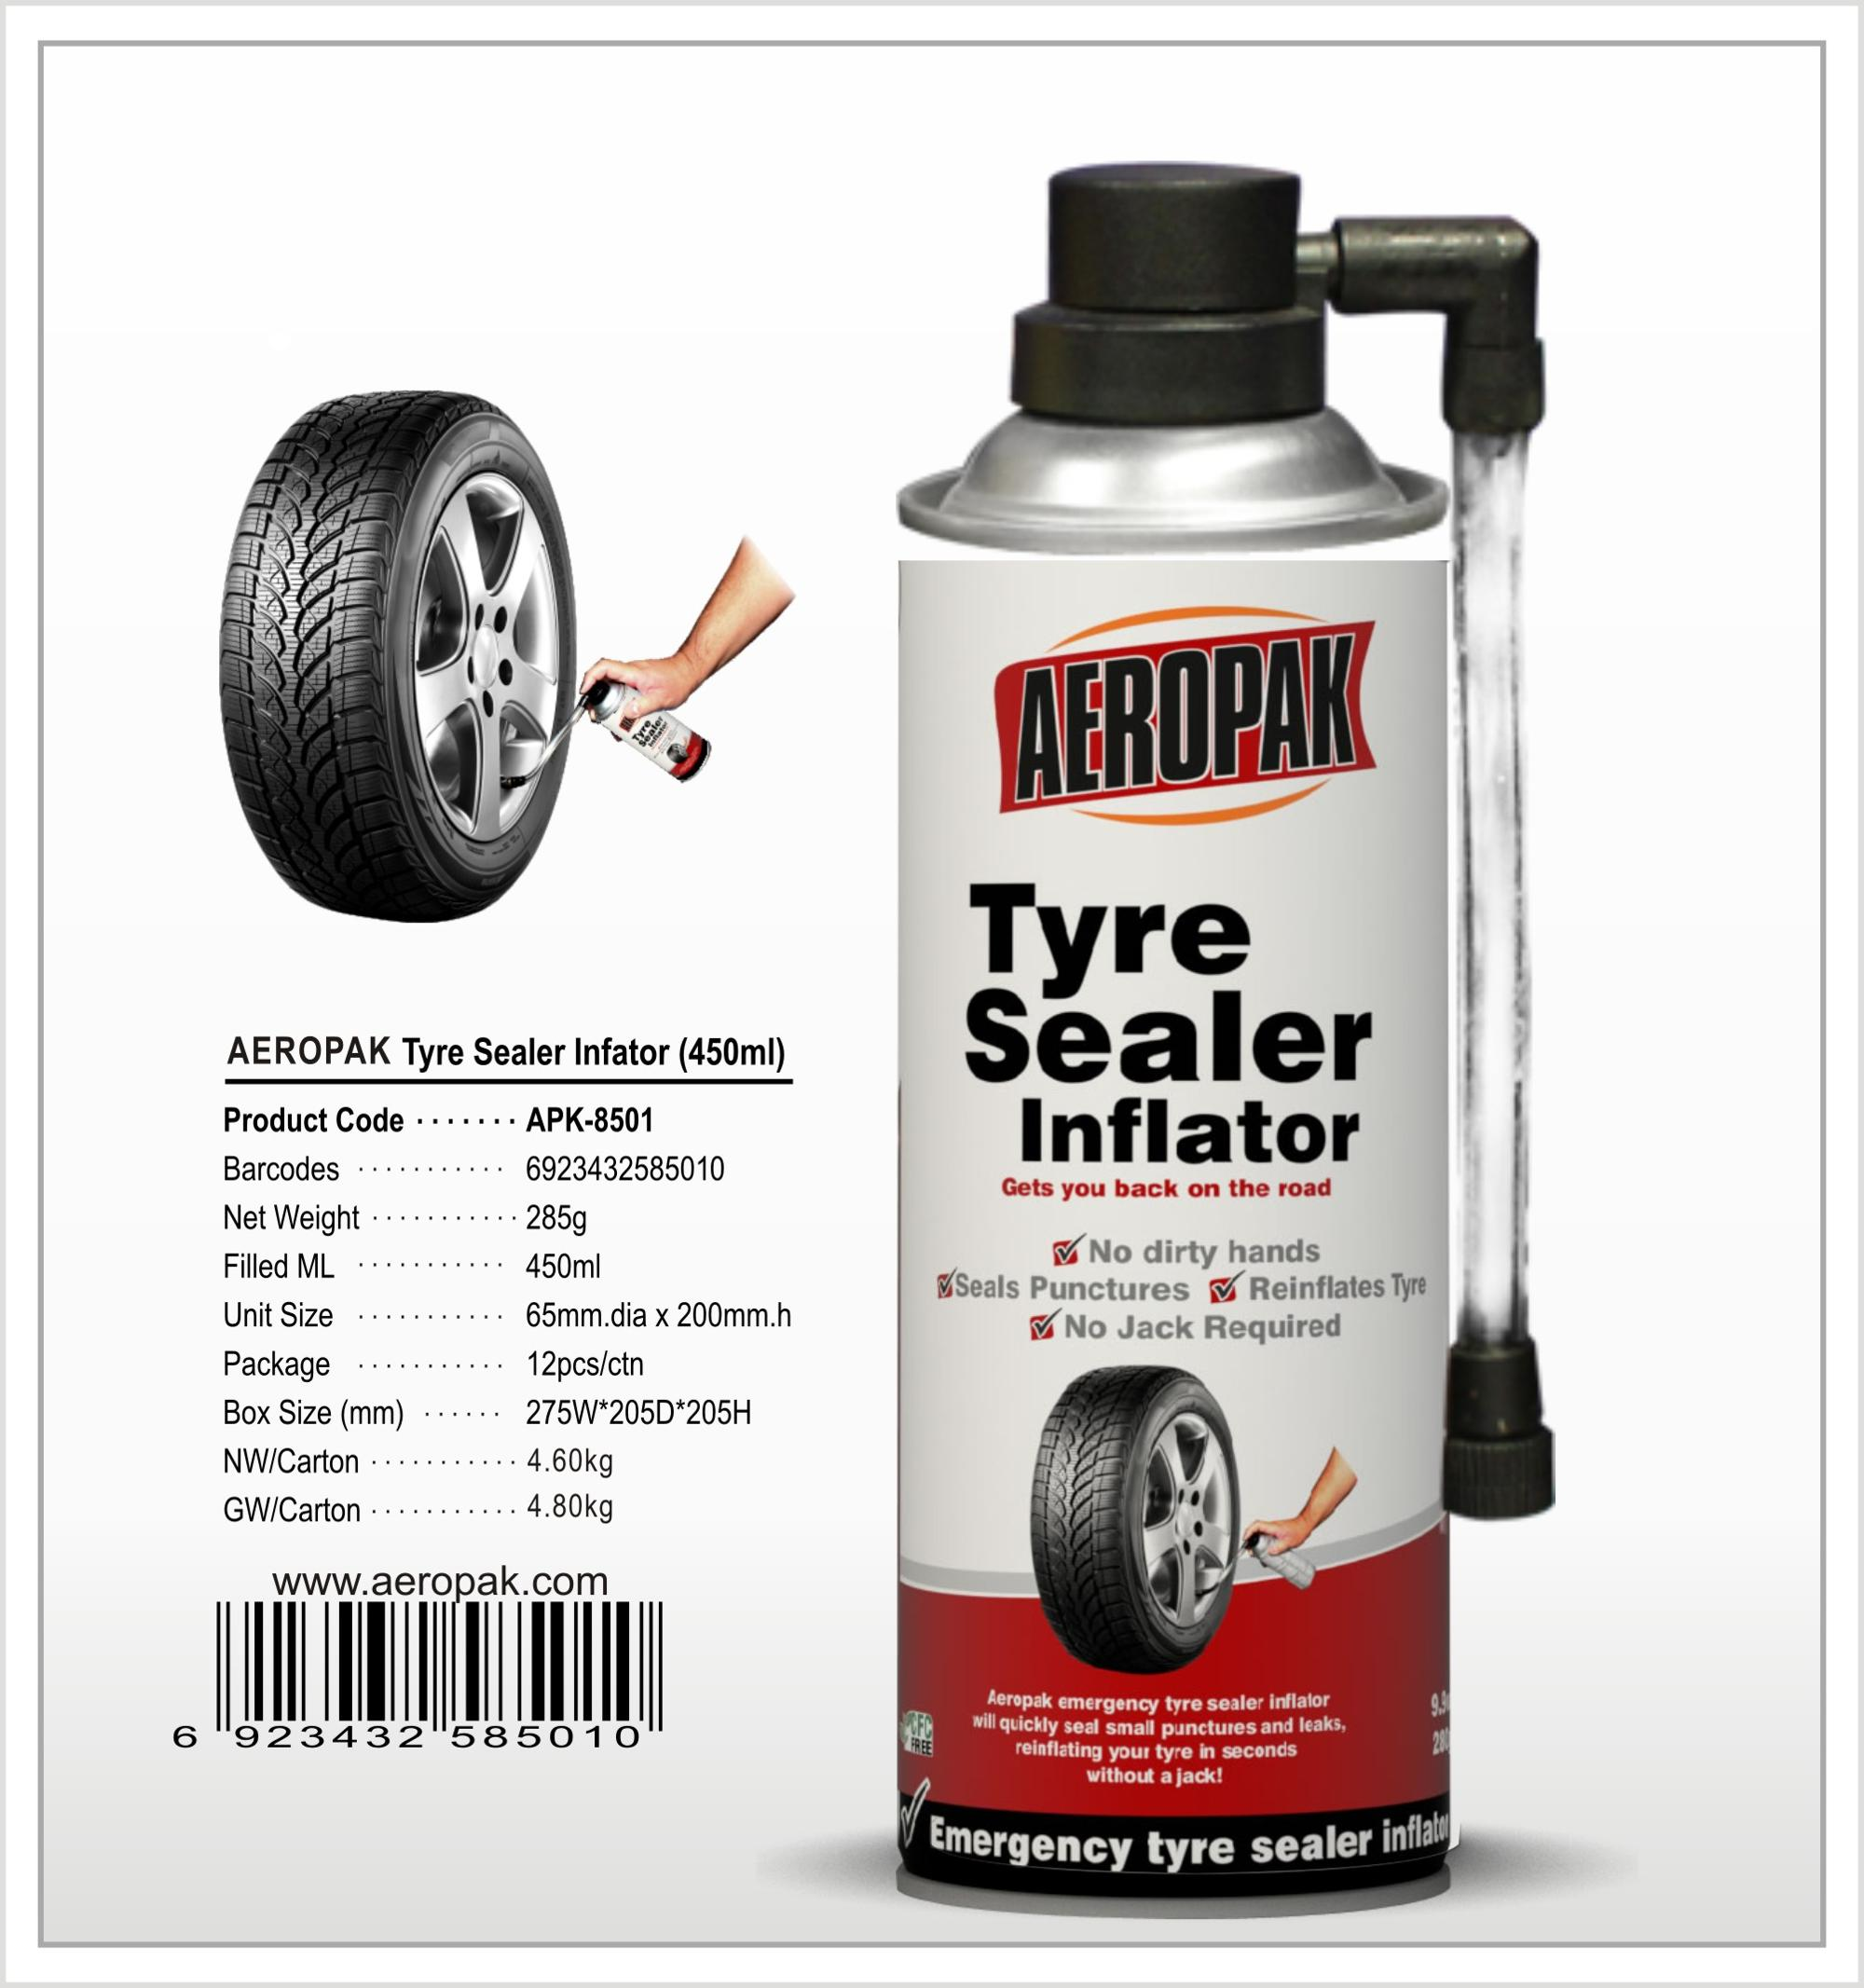 Aeropak Flatfix Tire Sealant Tyre Repair Spray - Buy Fix Flat Tire Sealant  Tire Repair Spray,Fix Flat Tire Sealant,Tire Foam Spray Product on